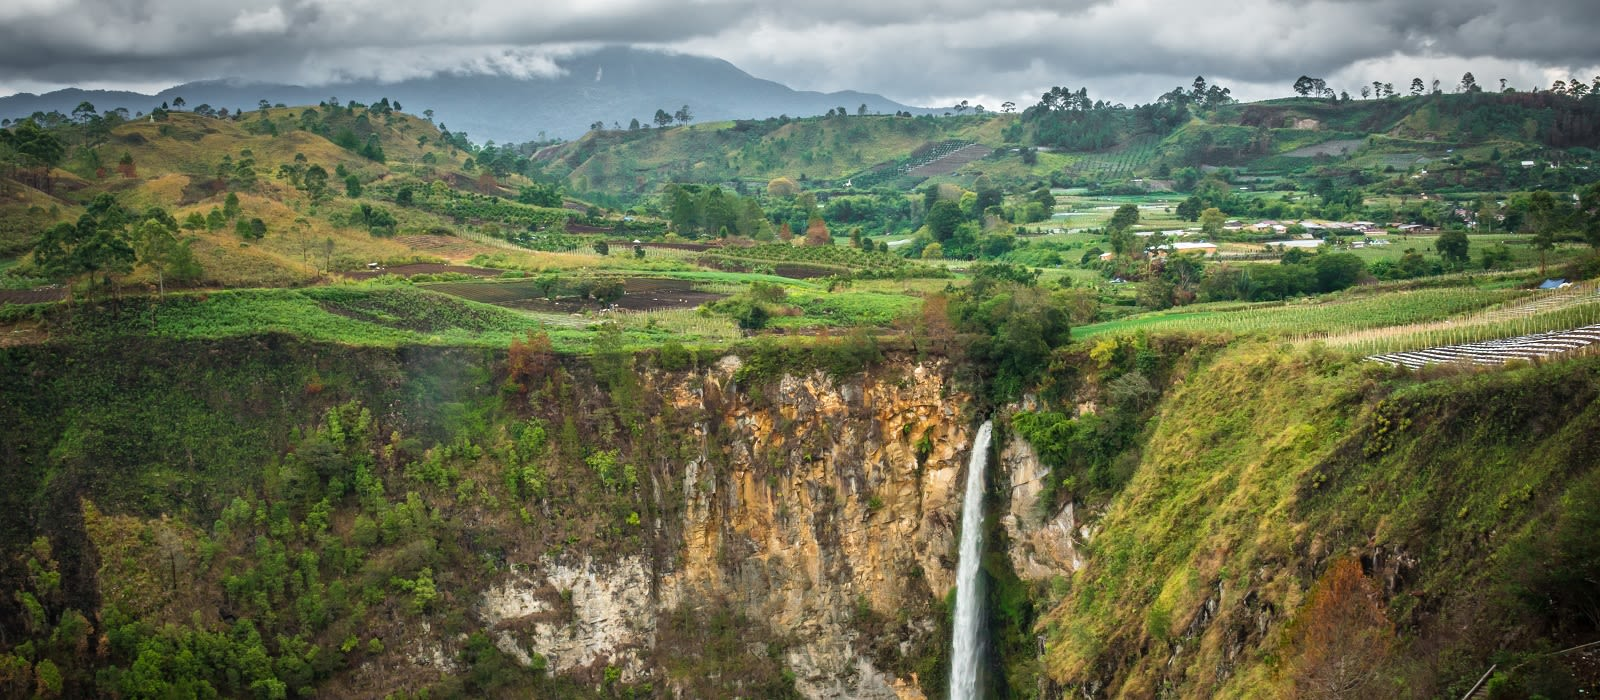 Die Klassiker auf Sumatra und Java Urlaub 4